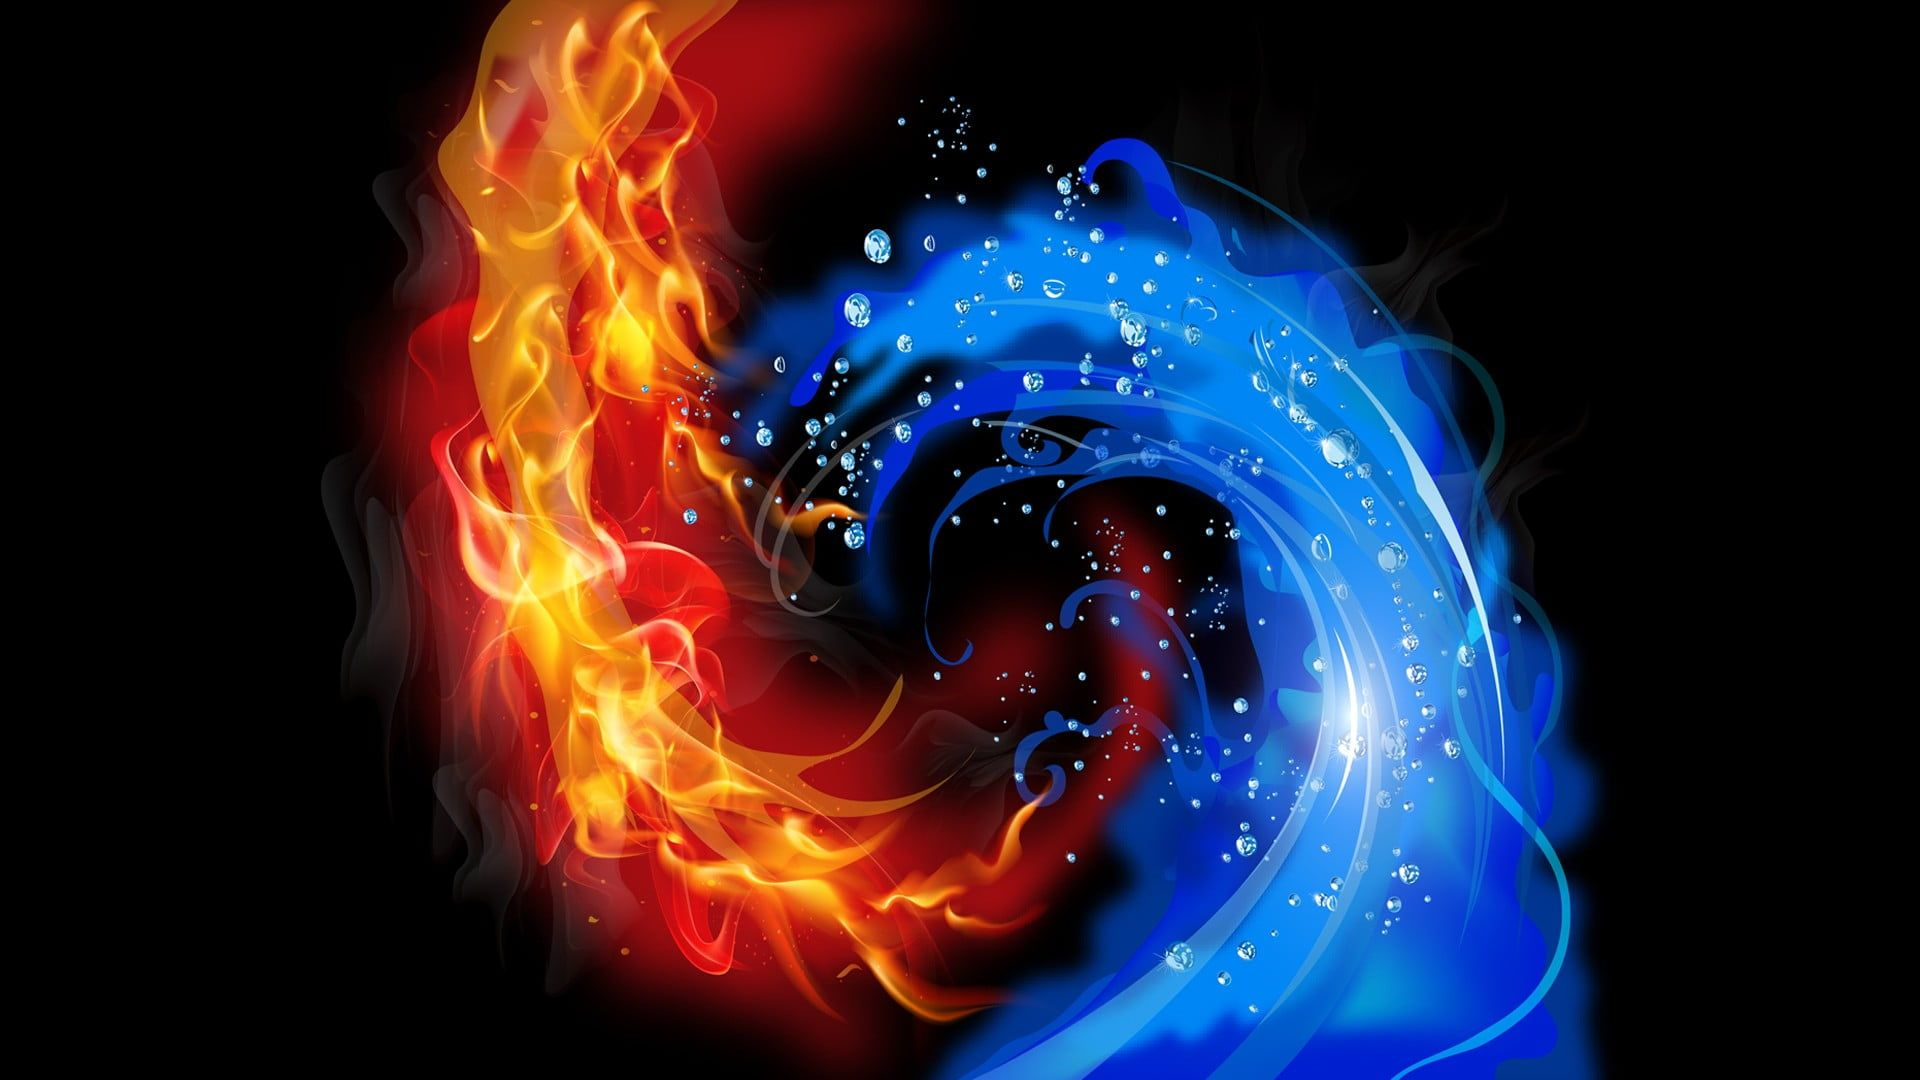 Fire And Ice Wallpaper Abstract Black Background Fire Water Vector 1080p Wallpaper Hdwallpaper De In 2021 Fire And Ice Wallpaper Fire And Ice Black Backgrounds 1080p fire and water wallpaper hd